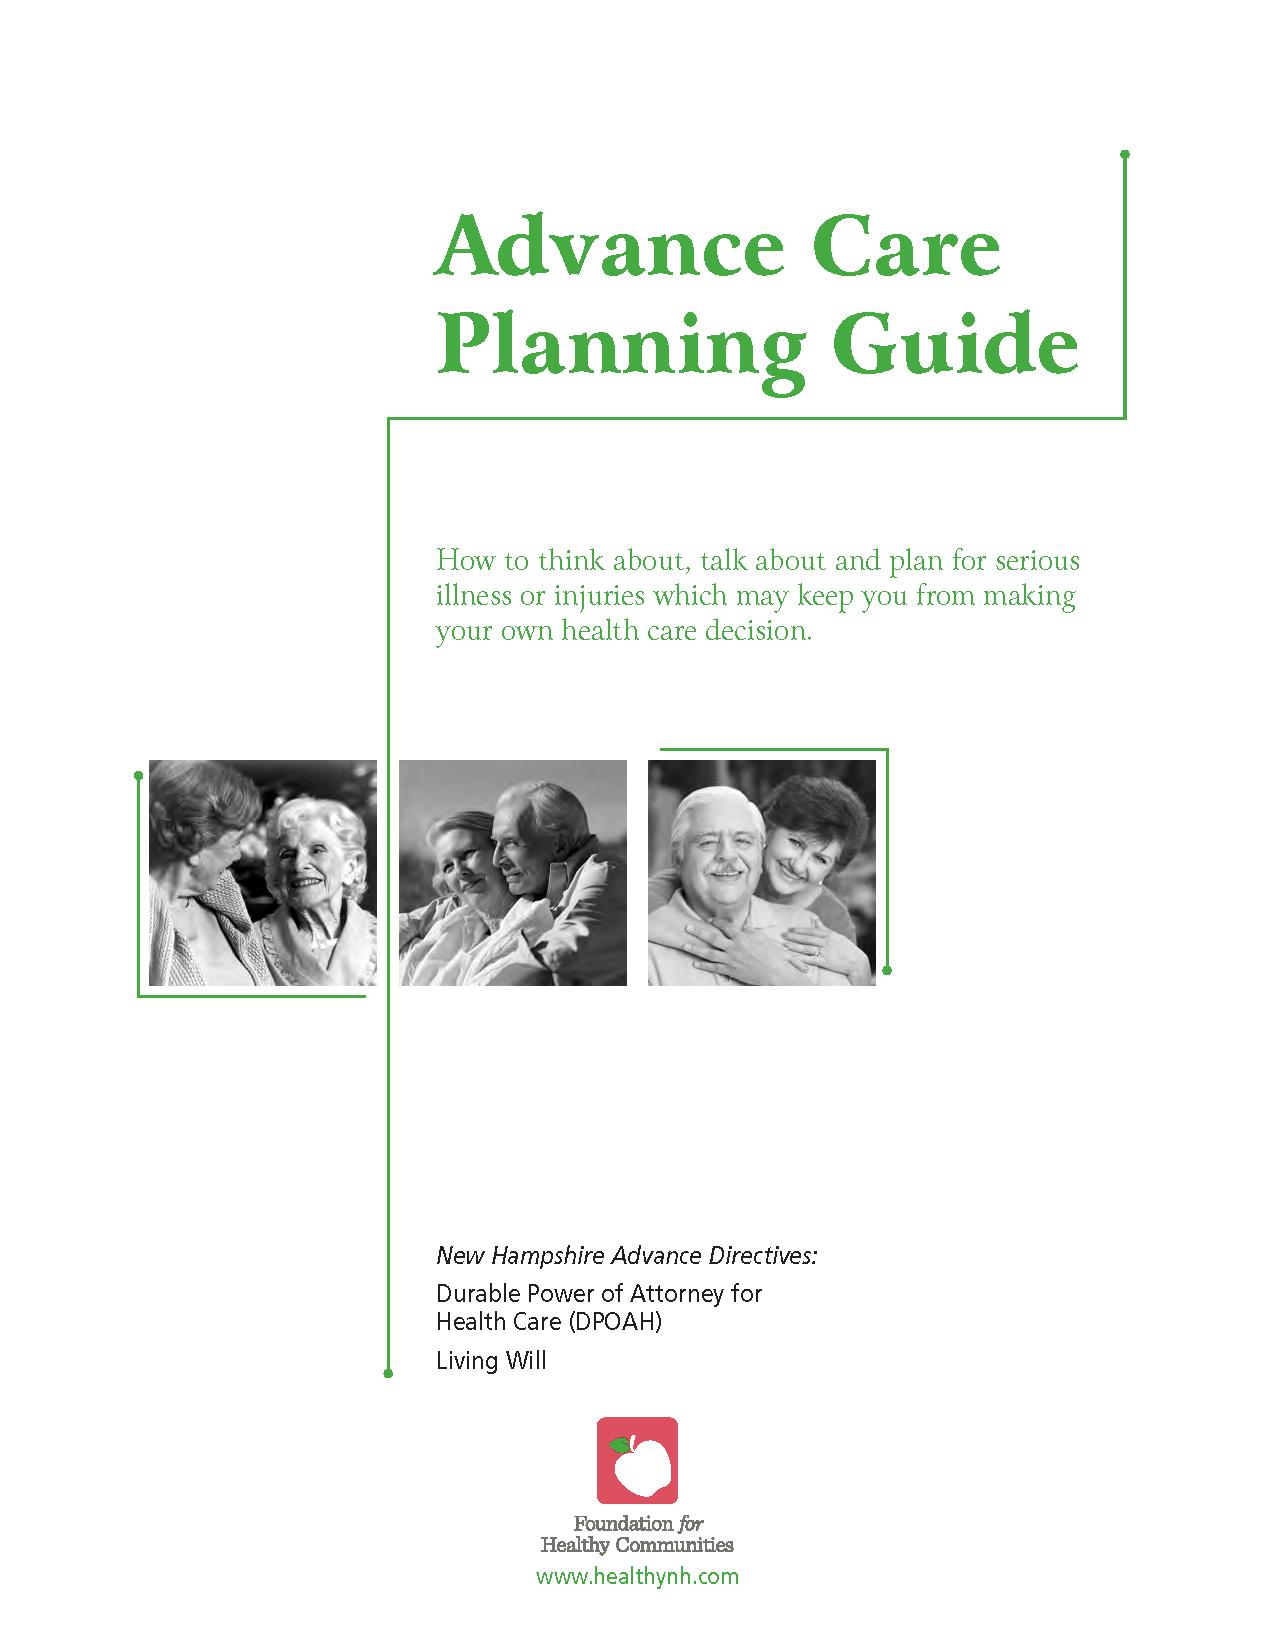 New Hampshire Advance Directive For Health Care